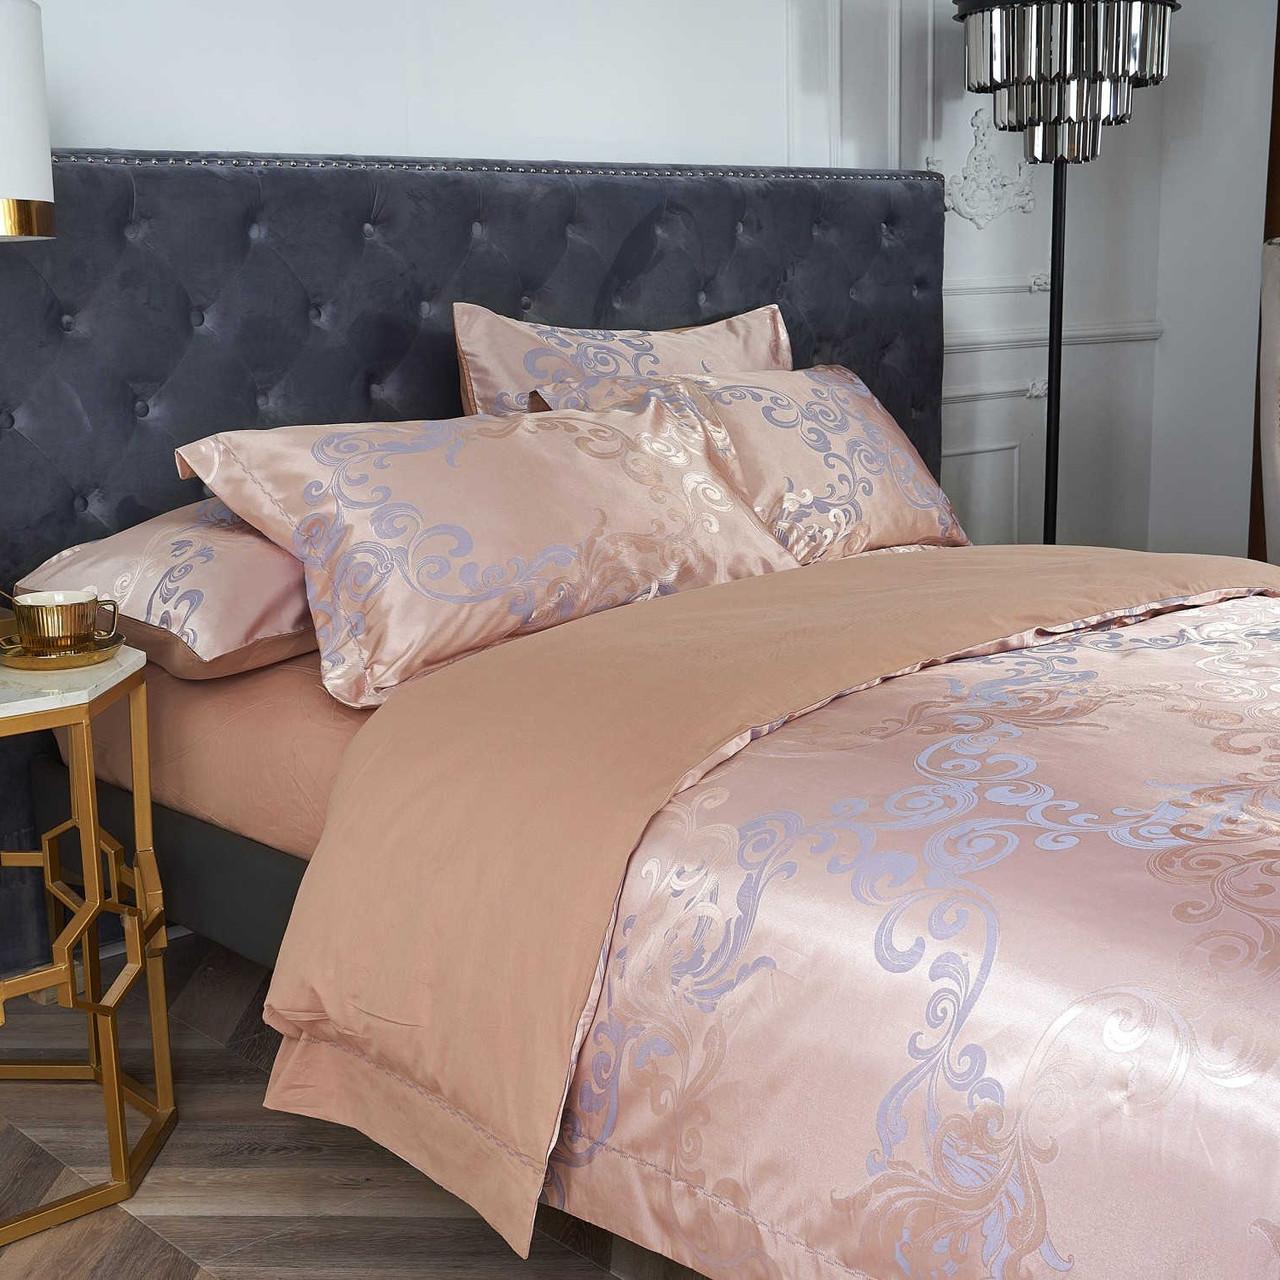 Dropshipping Wholesale Jacquard Fabric Bedding Set DM801K